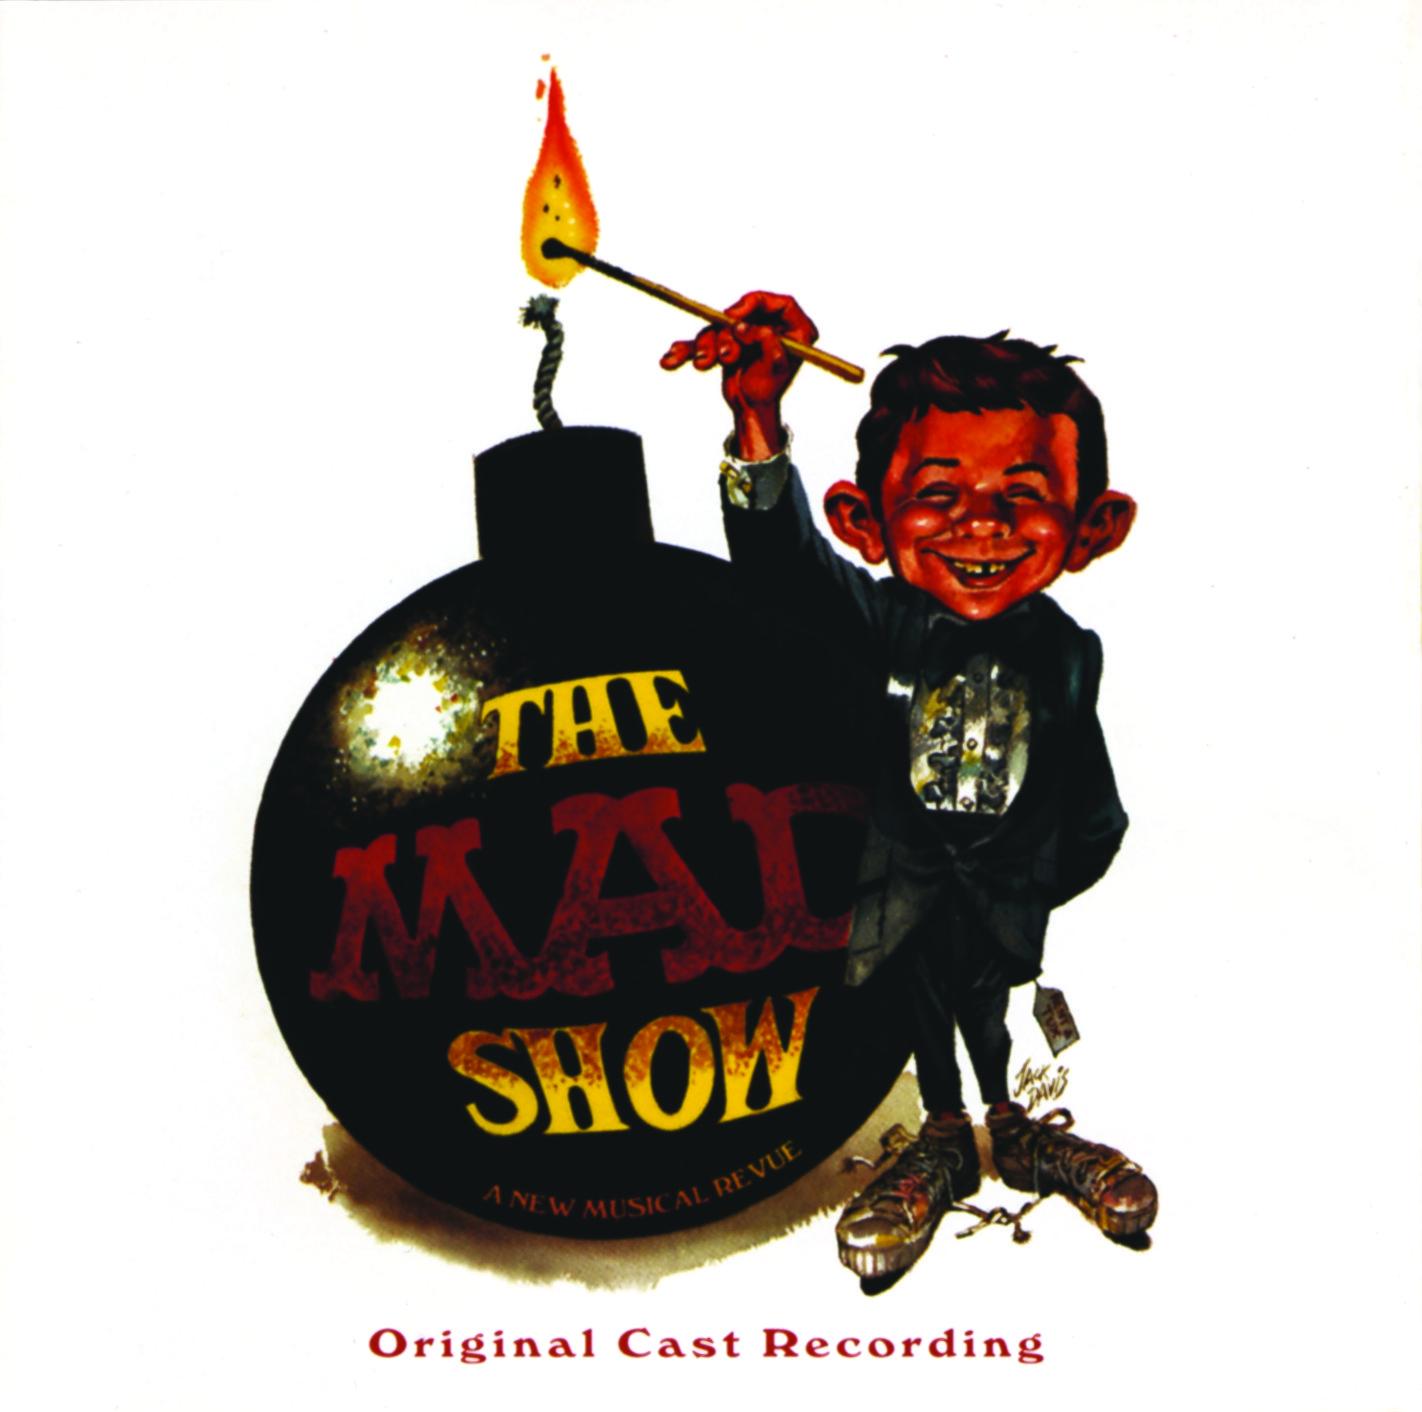 The Mad Show – Original Off-Broadway Cast Recording 1966